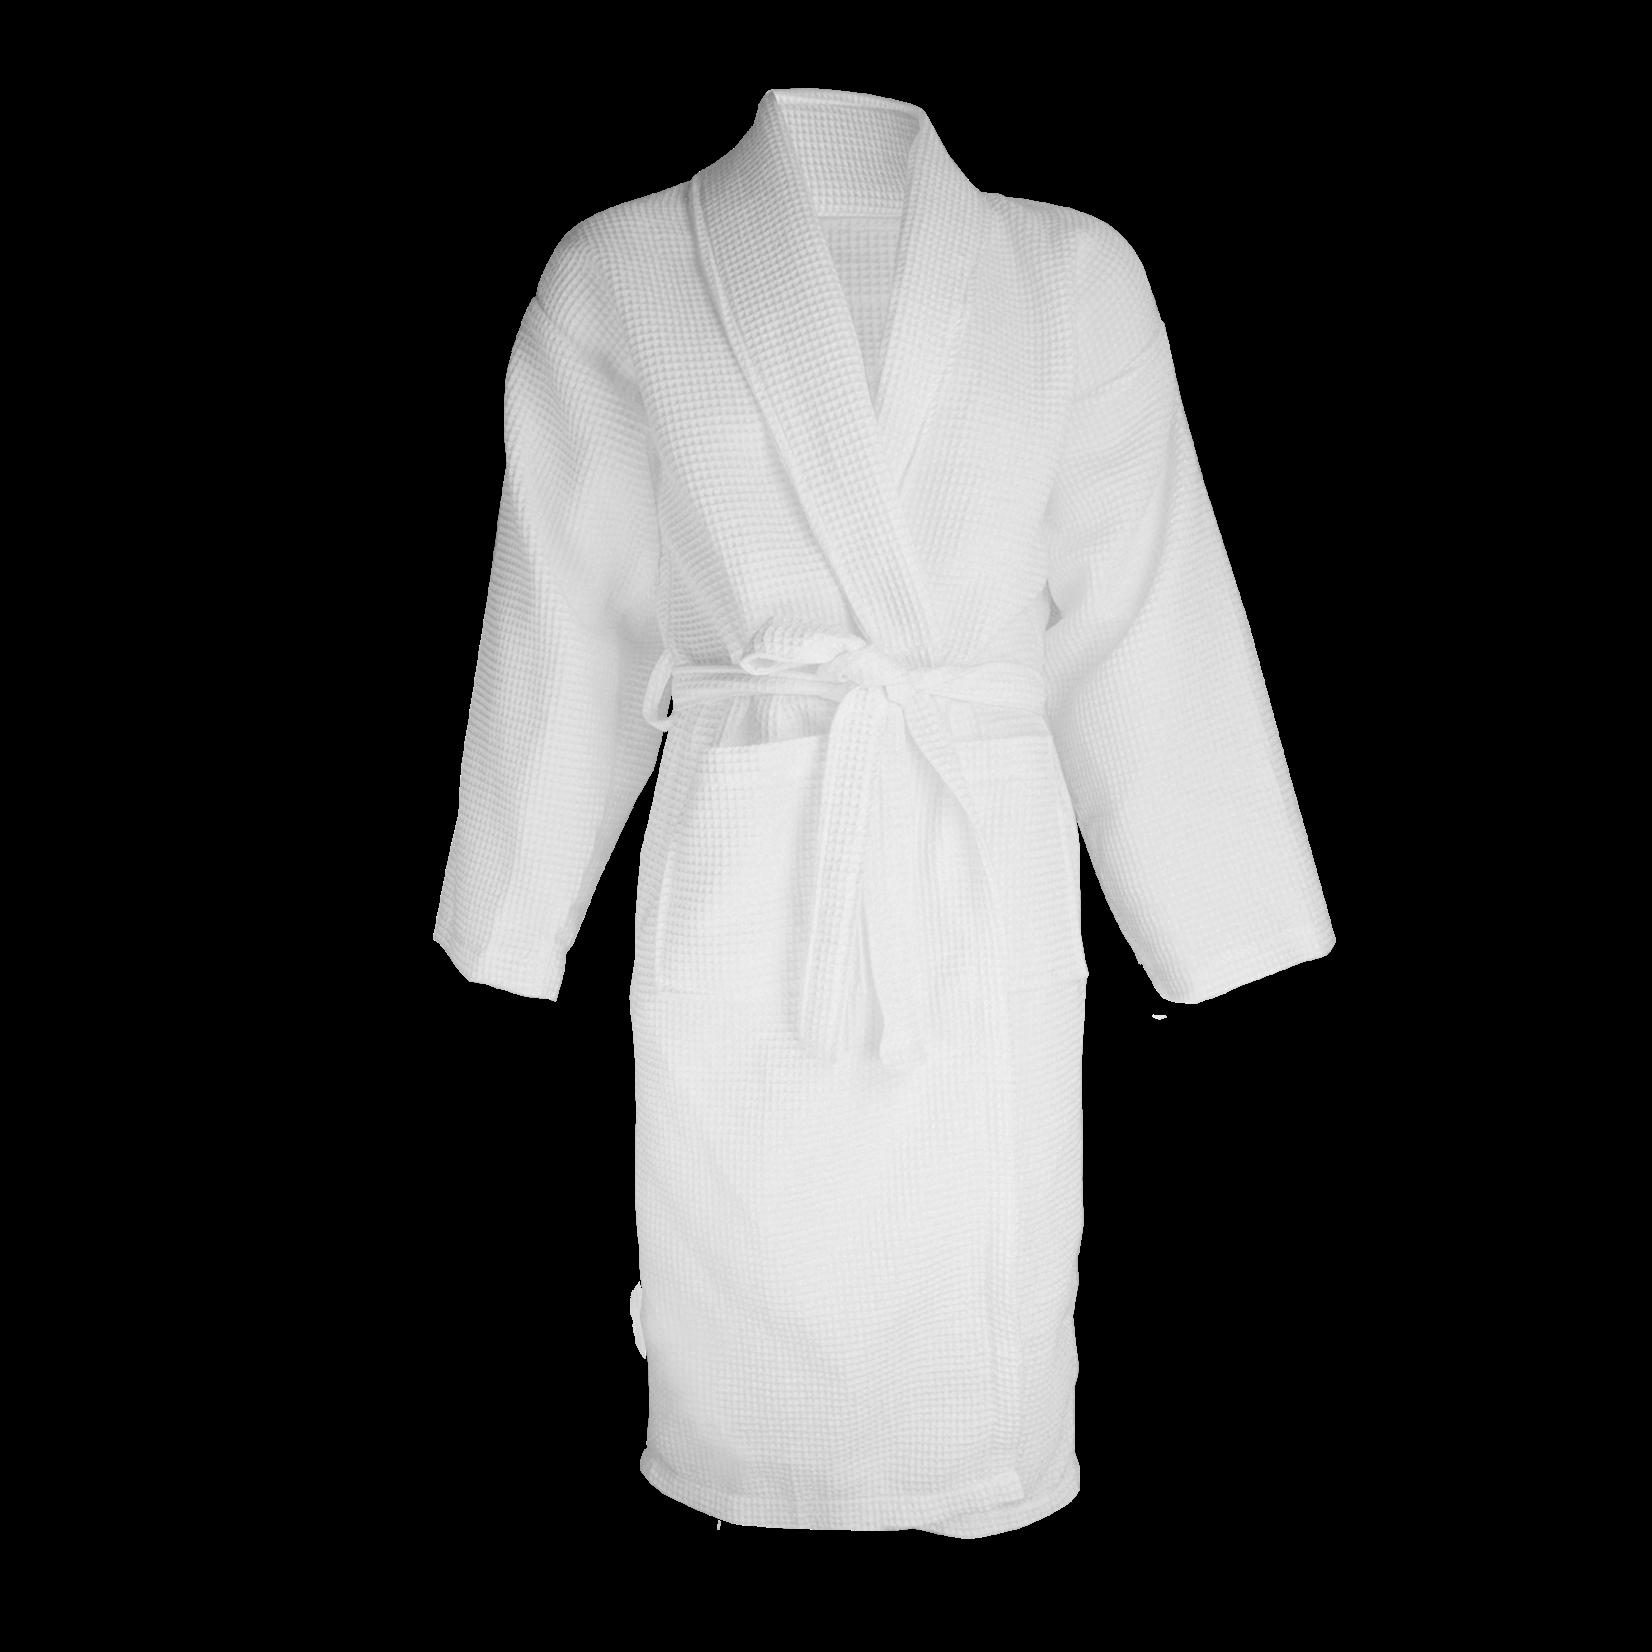 The One towelling Witte badjas in wafelstof